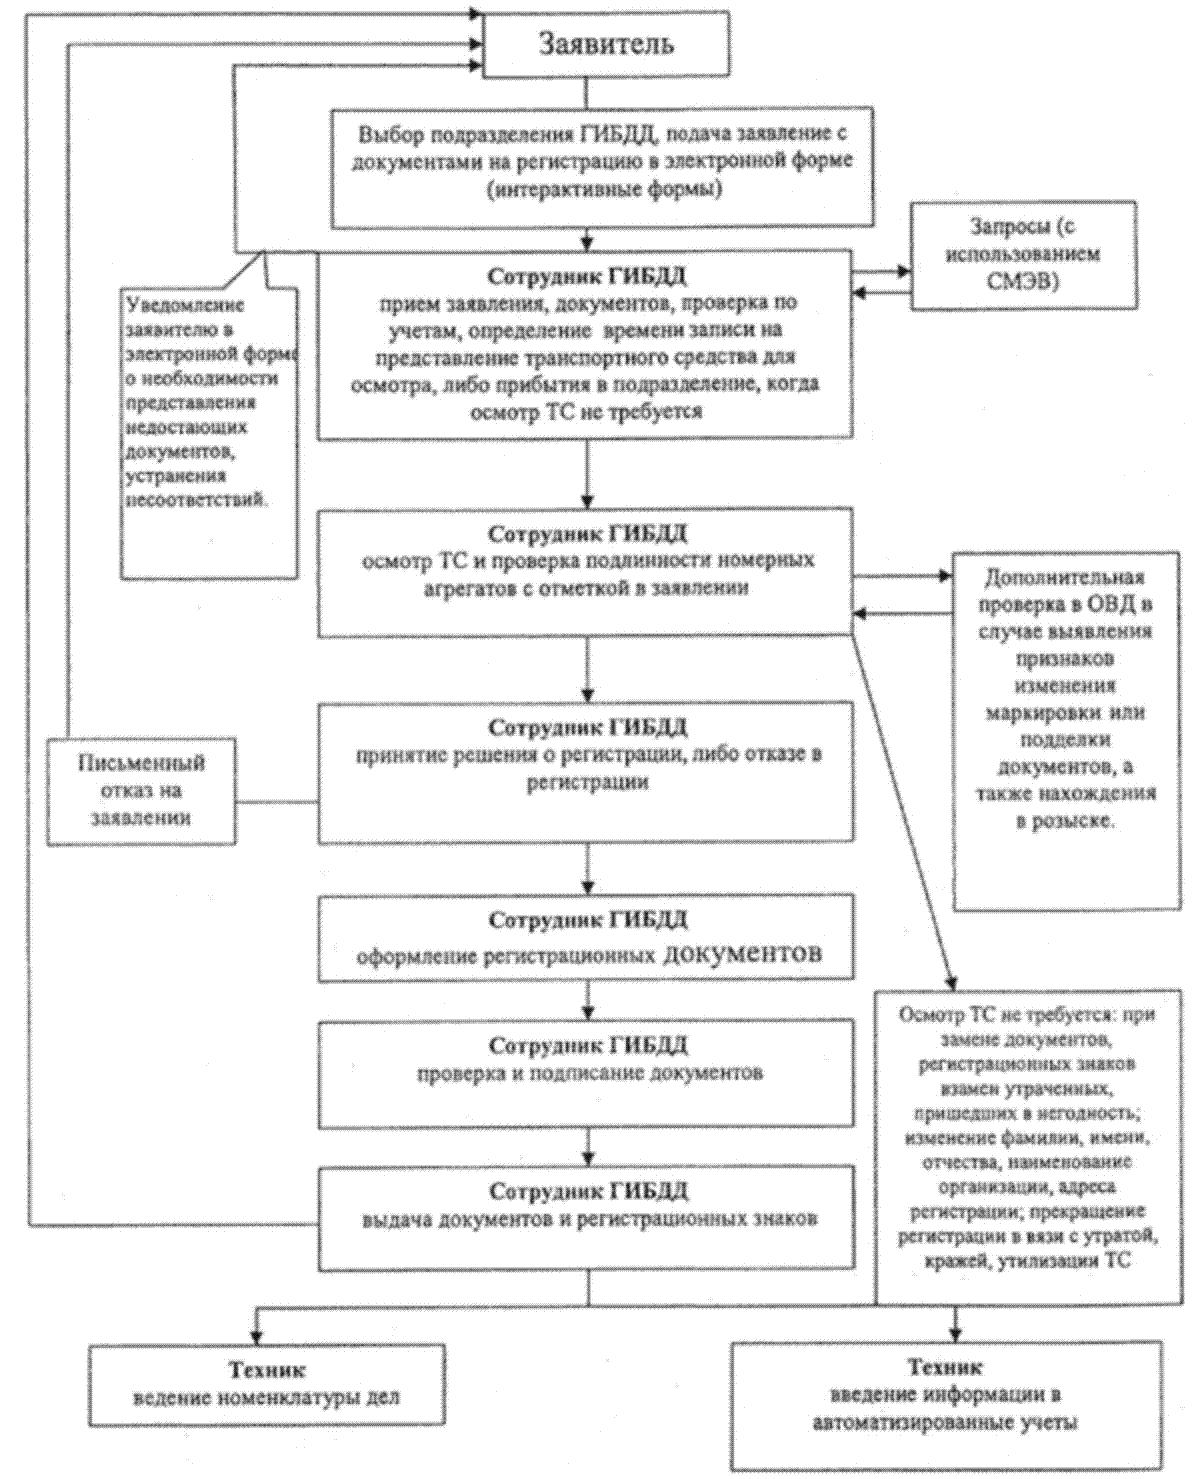 Блок схема к регламенту